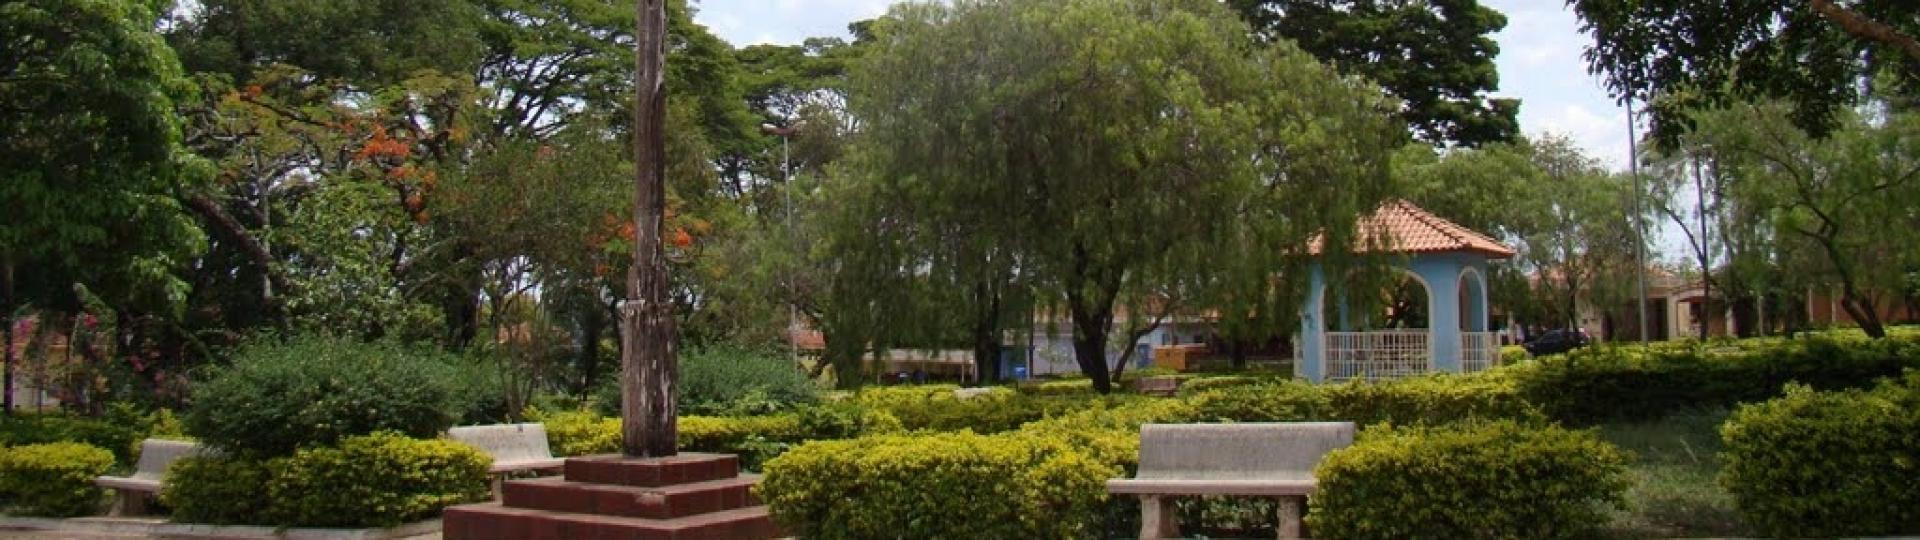 Jeriquara São Paulo fonte: www.abagrp.org.br